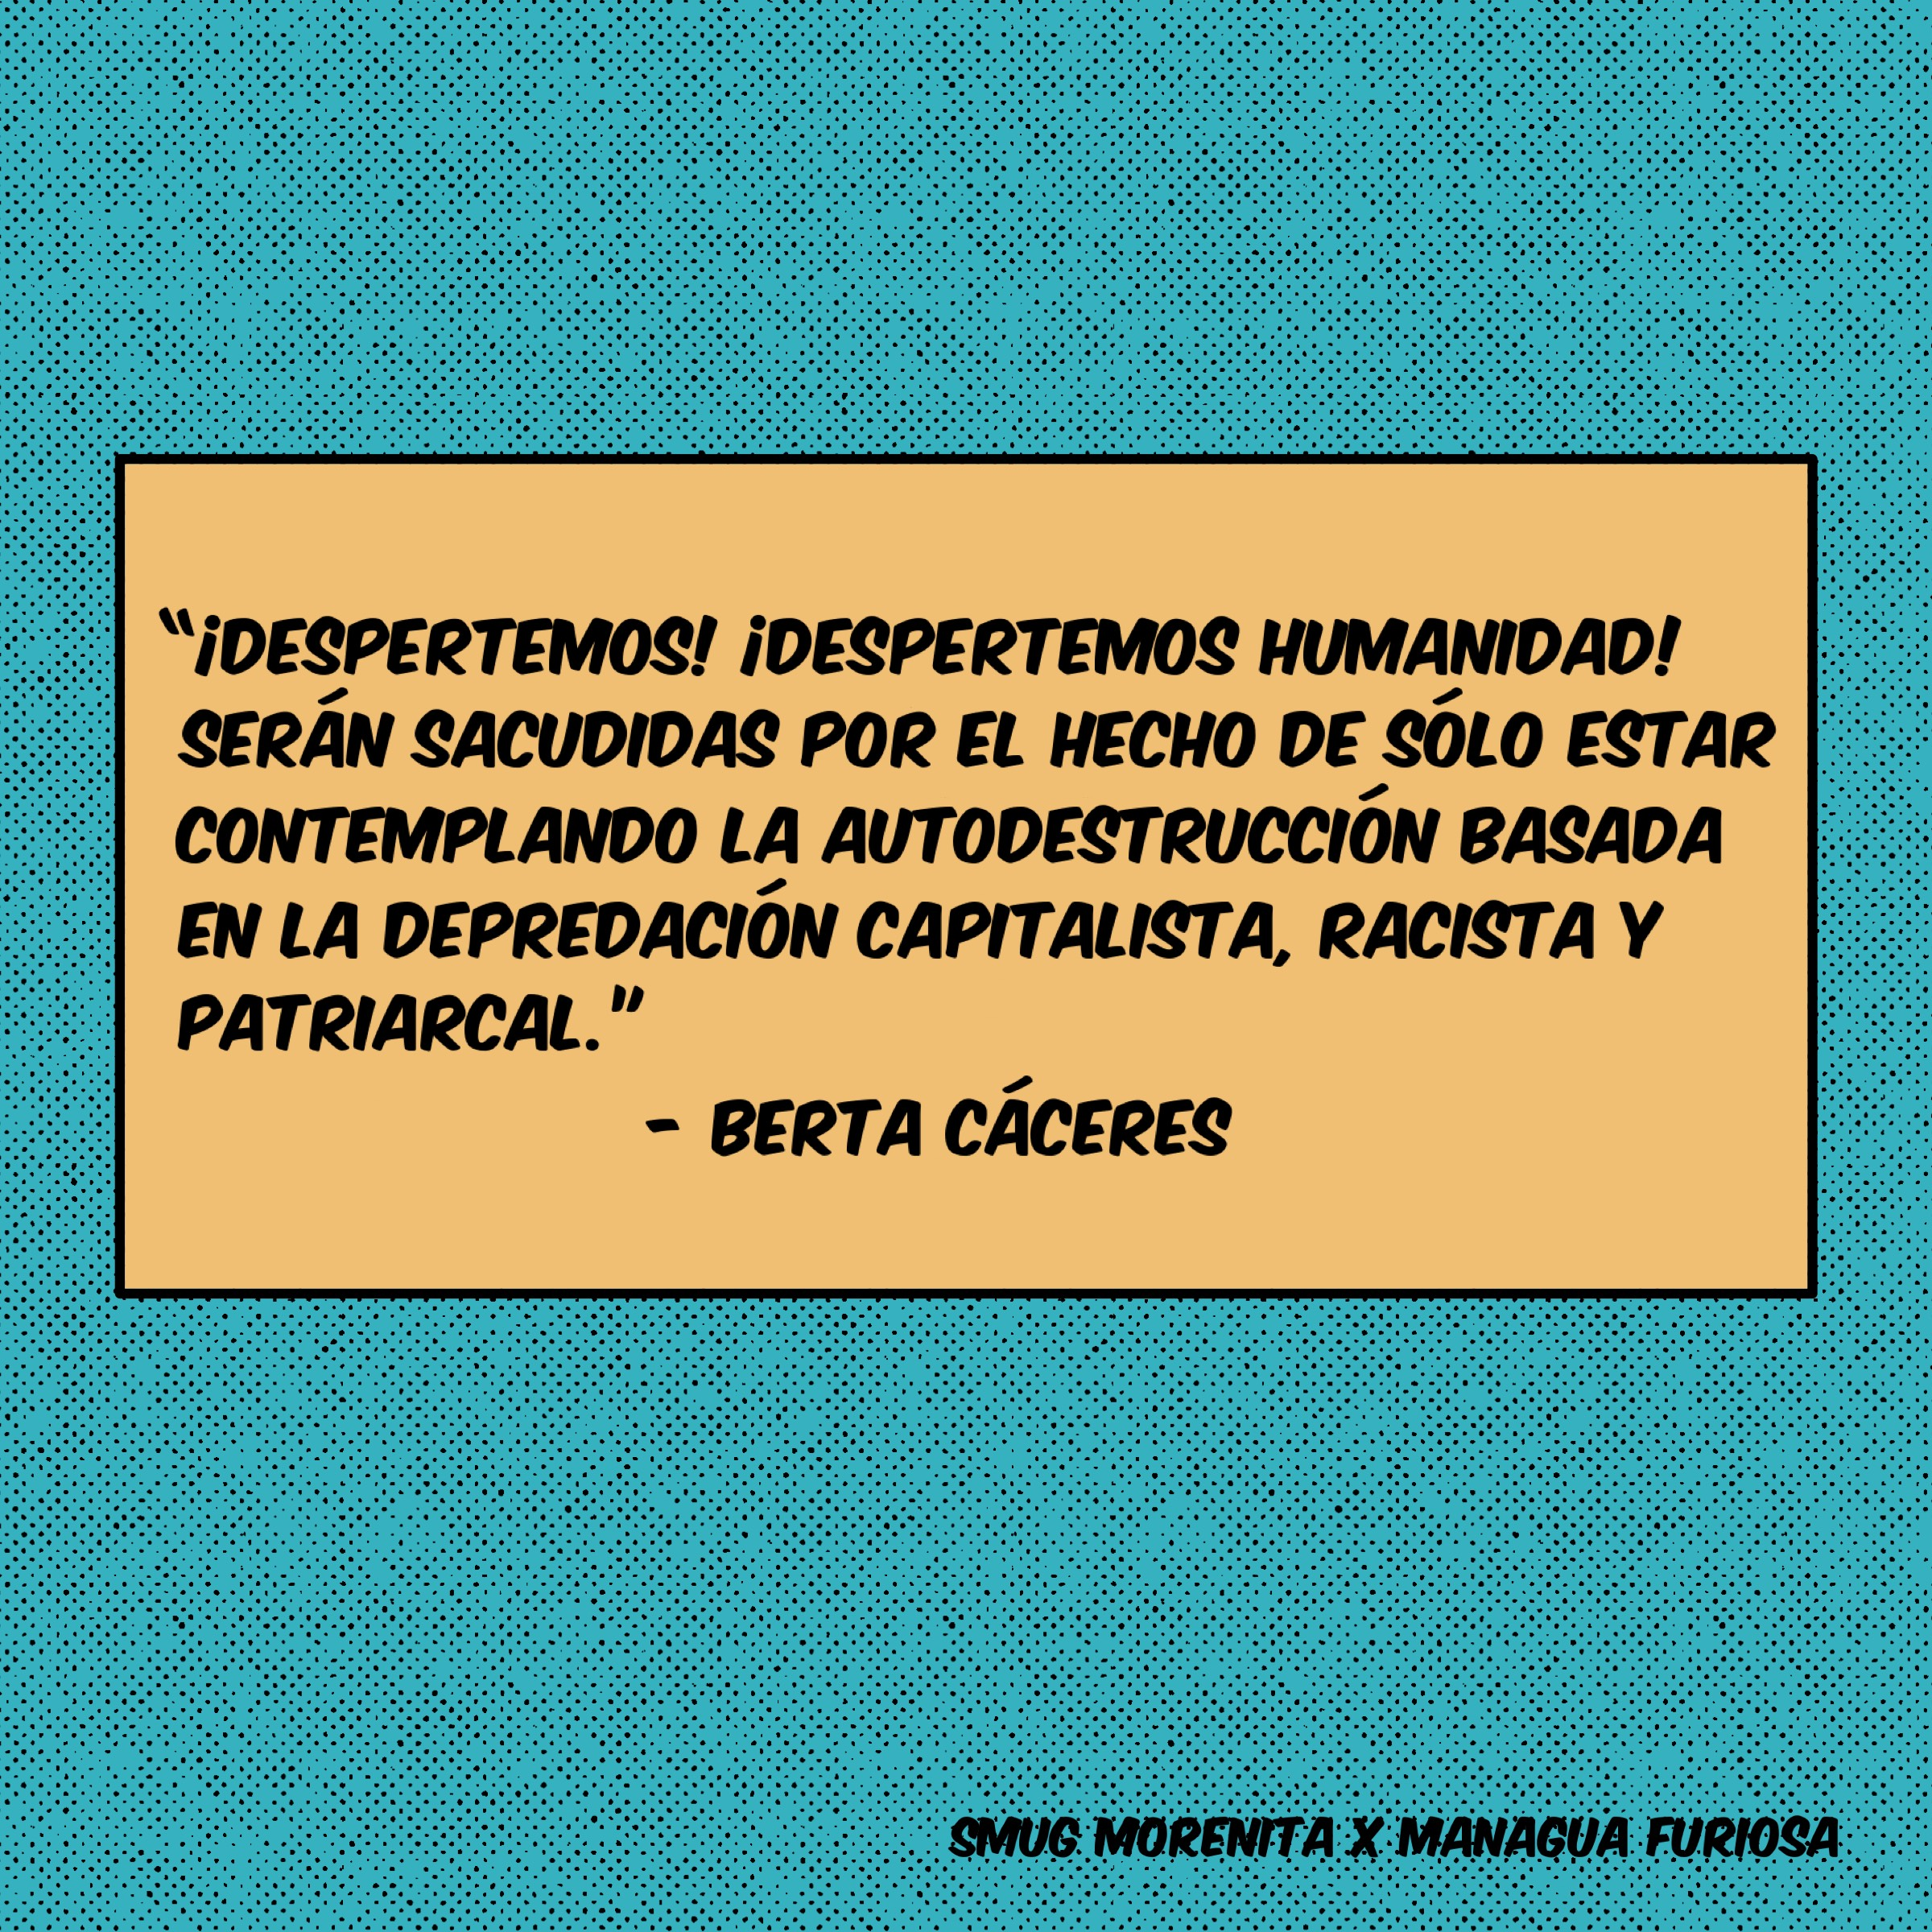 Berta Cáceres Quote - Web Image .jpg